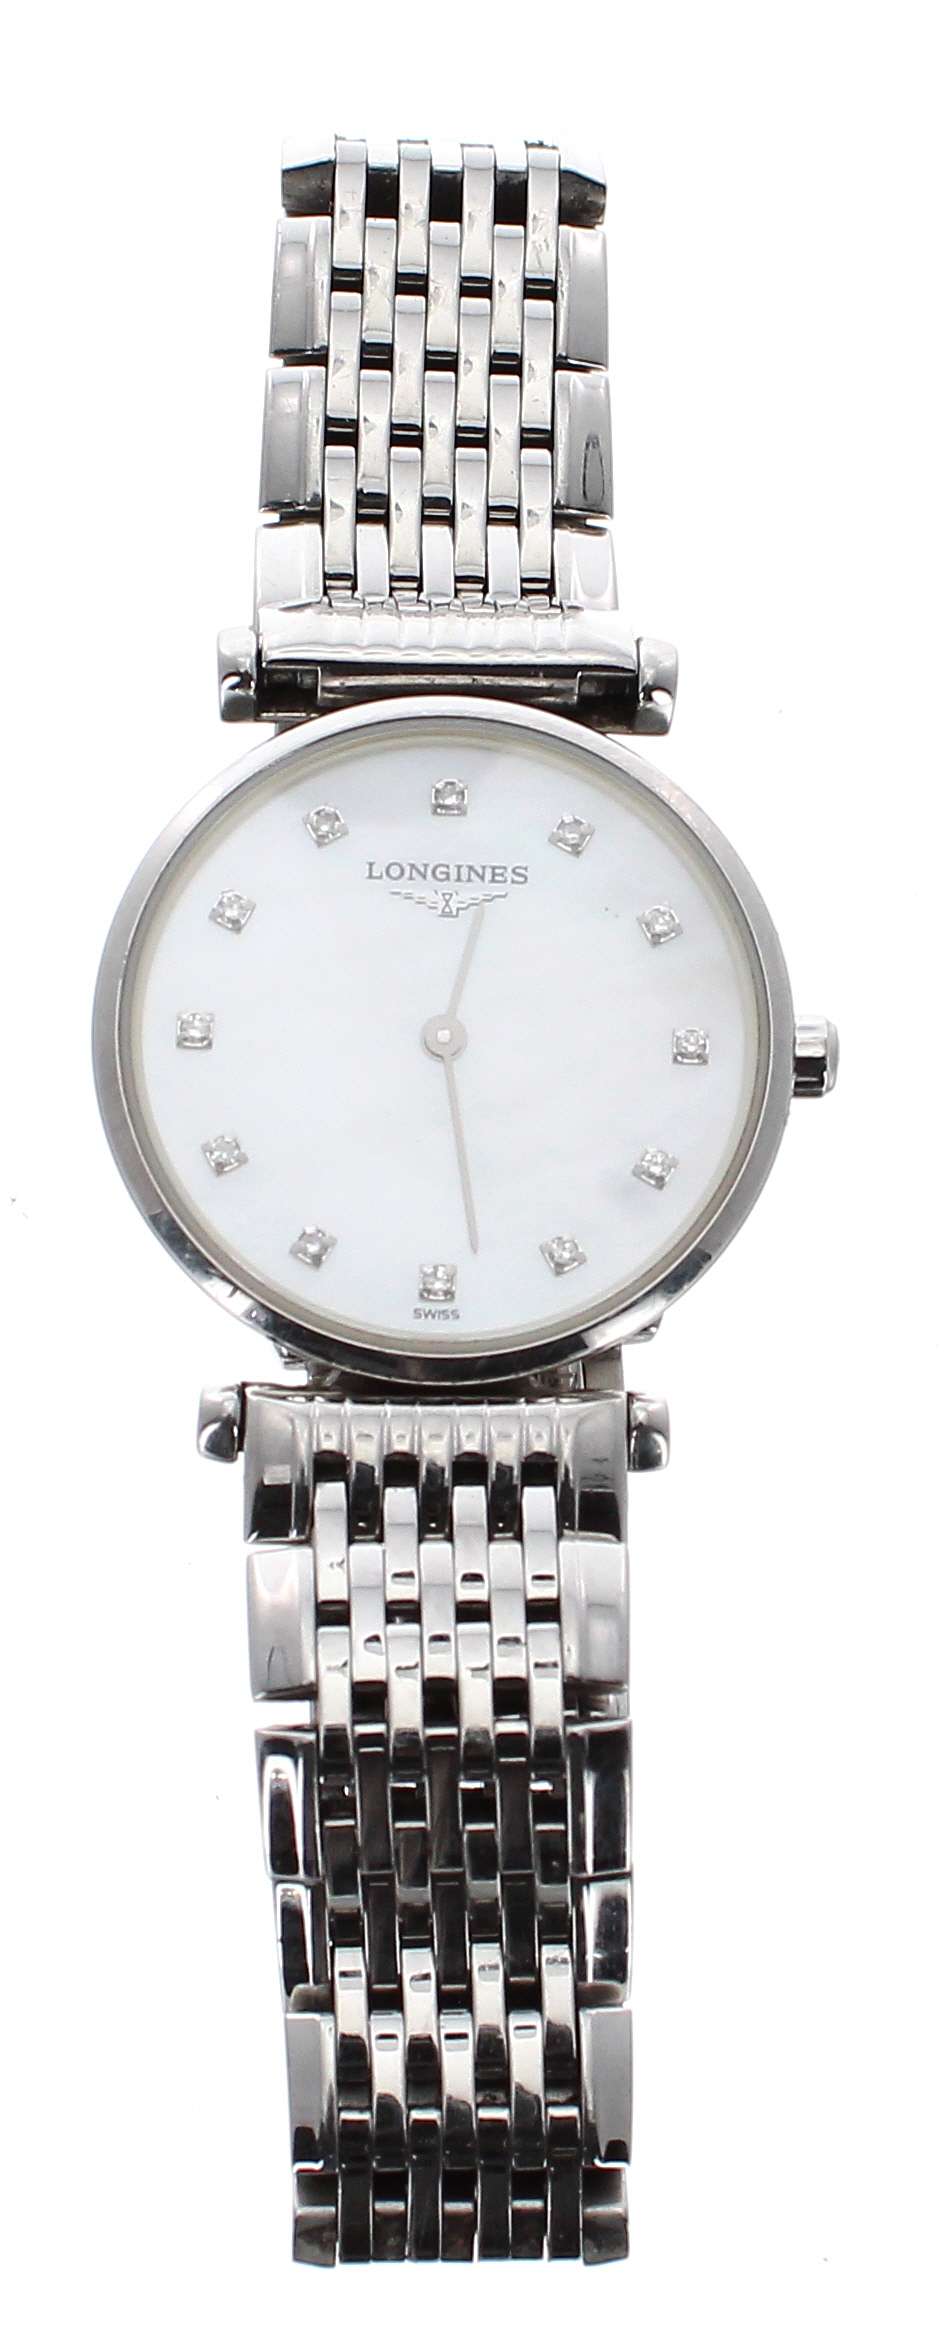 Lot 42 - Longines La Grande Classique stainless steel lady's bracelet watch, ref. L4.209.4, mother of pearl